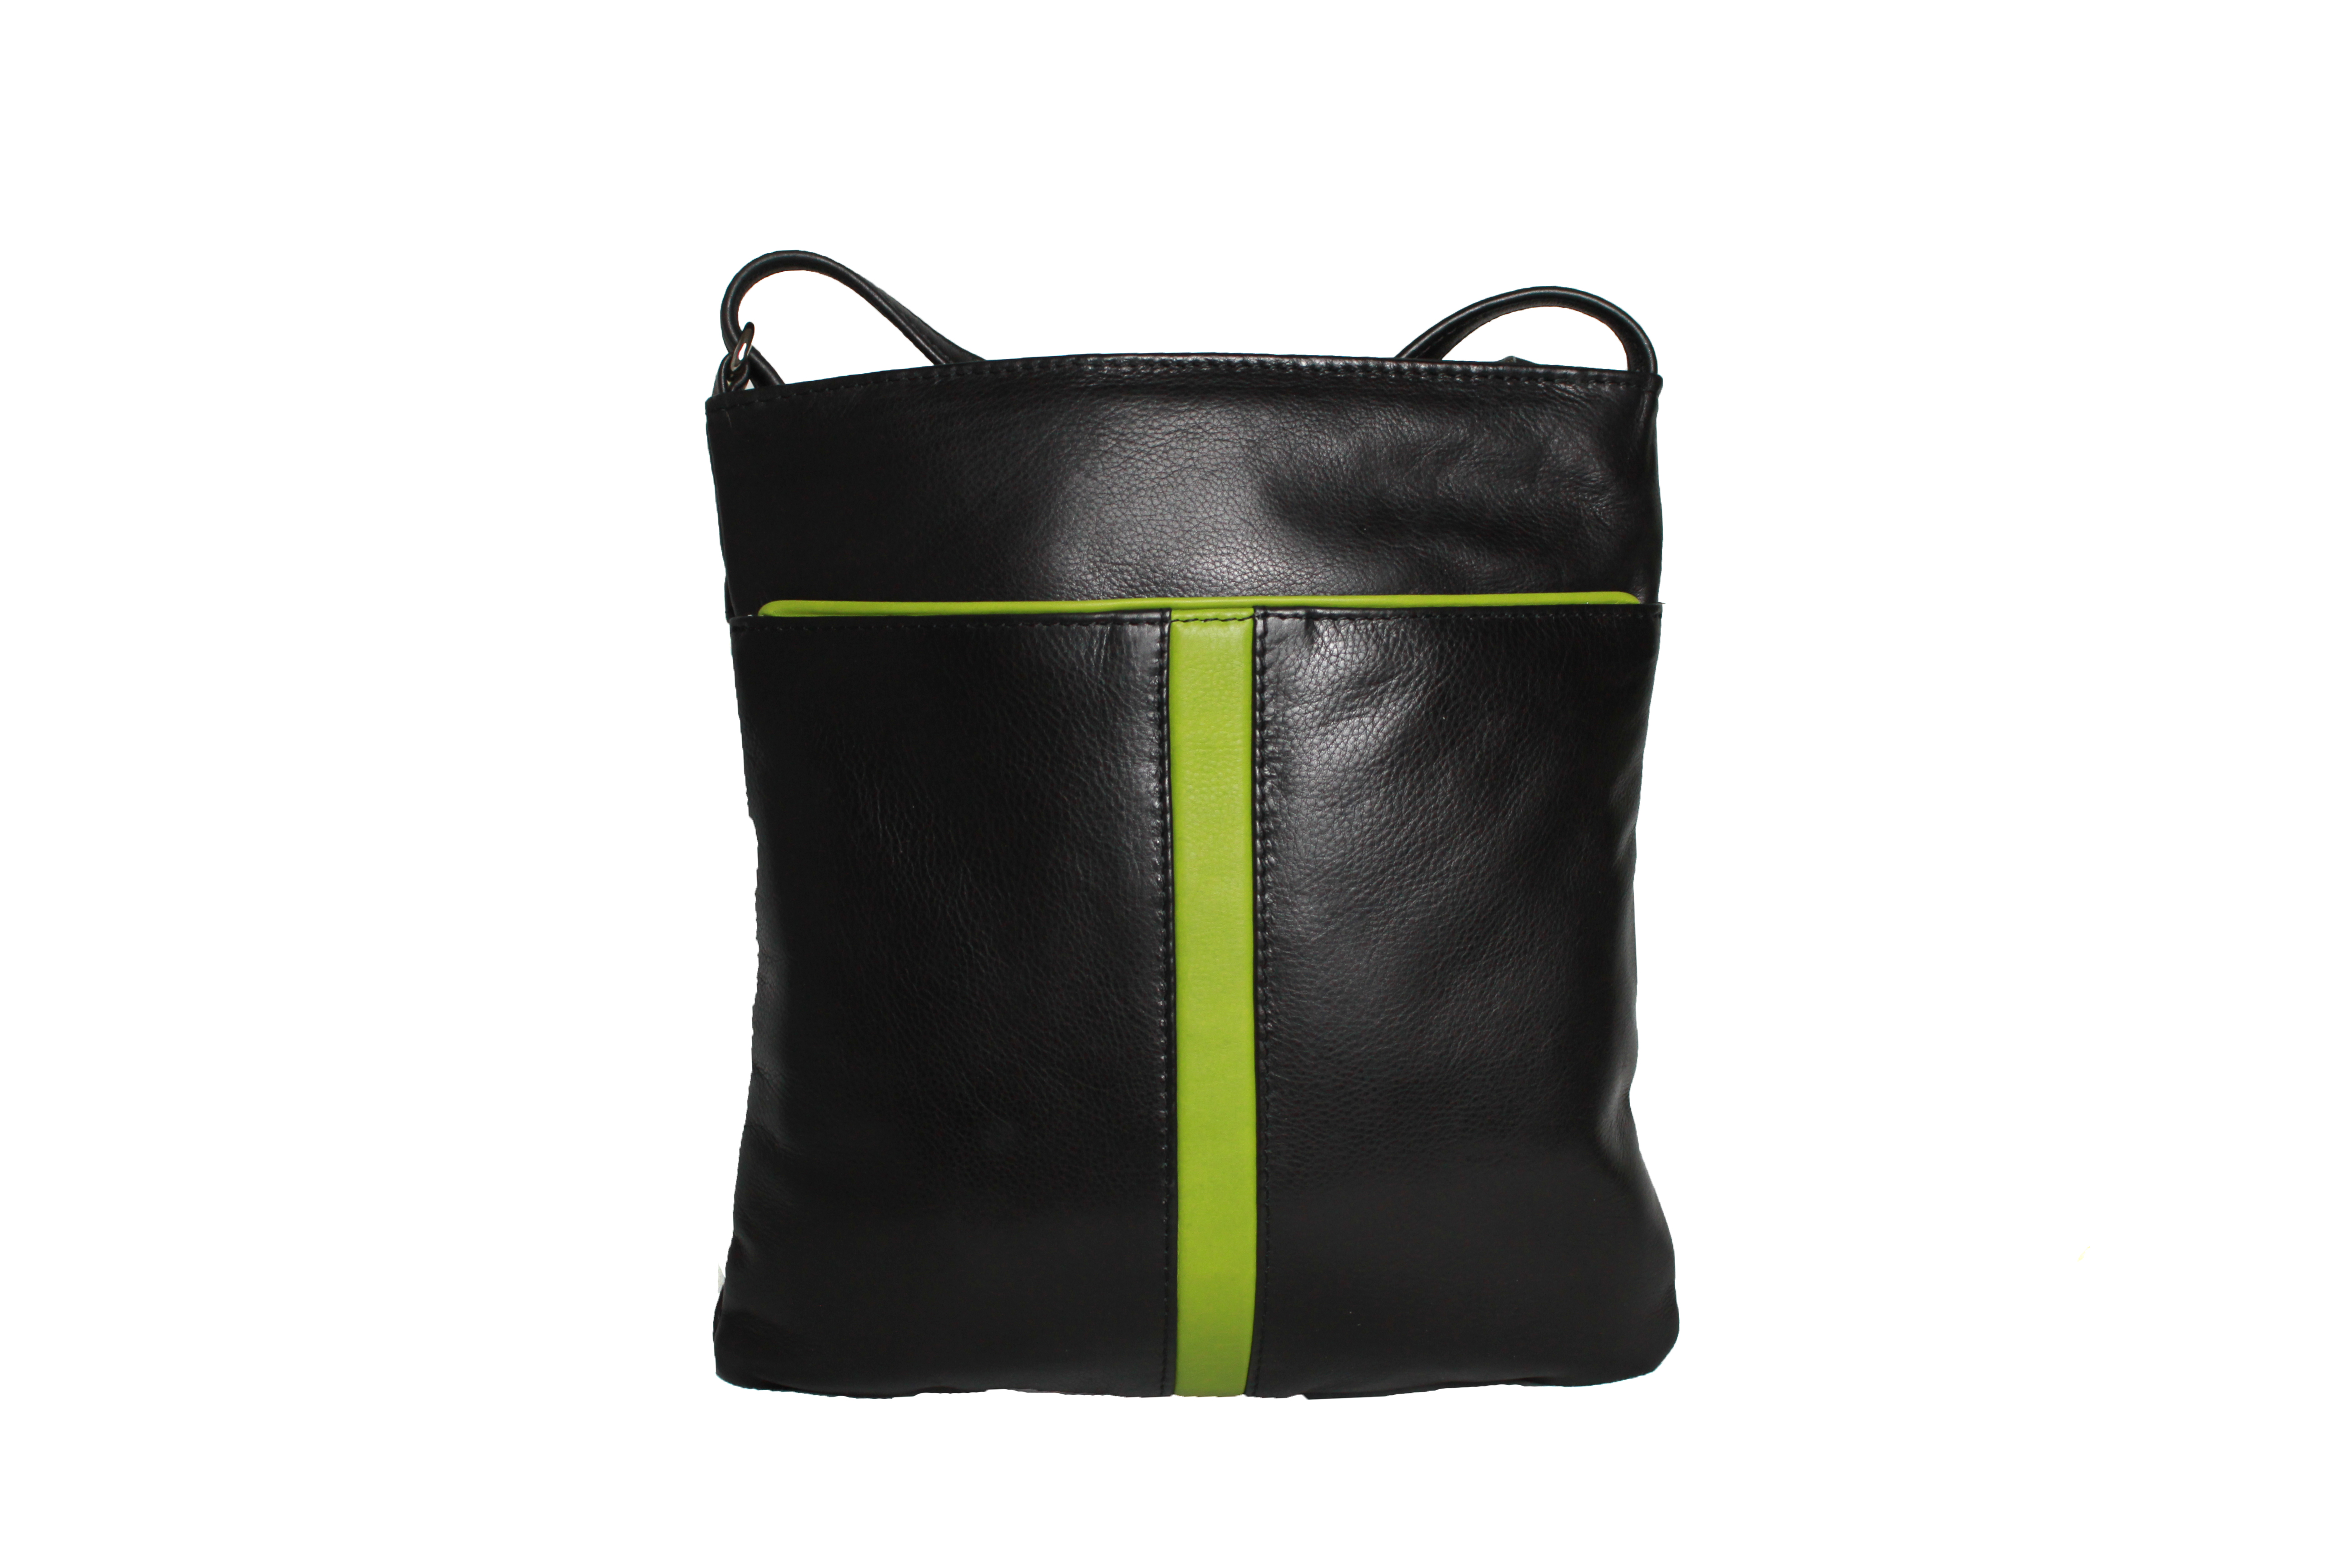 Marie handbag – more colours